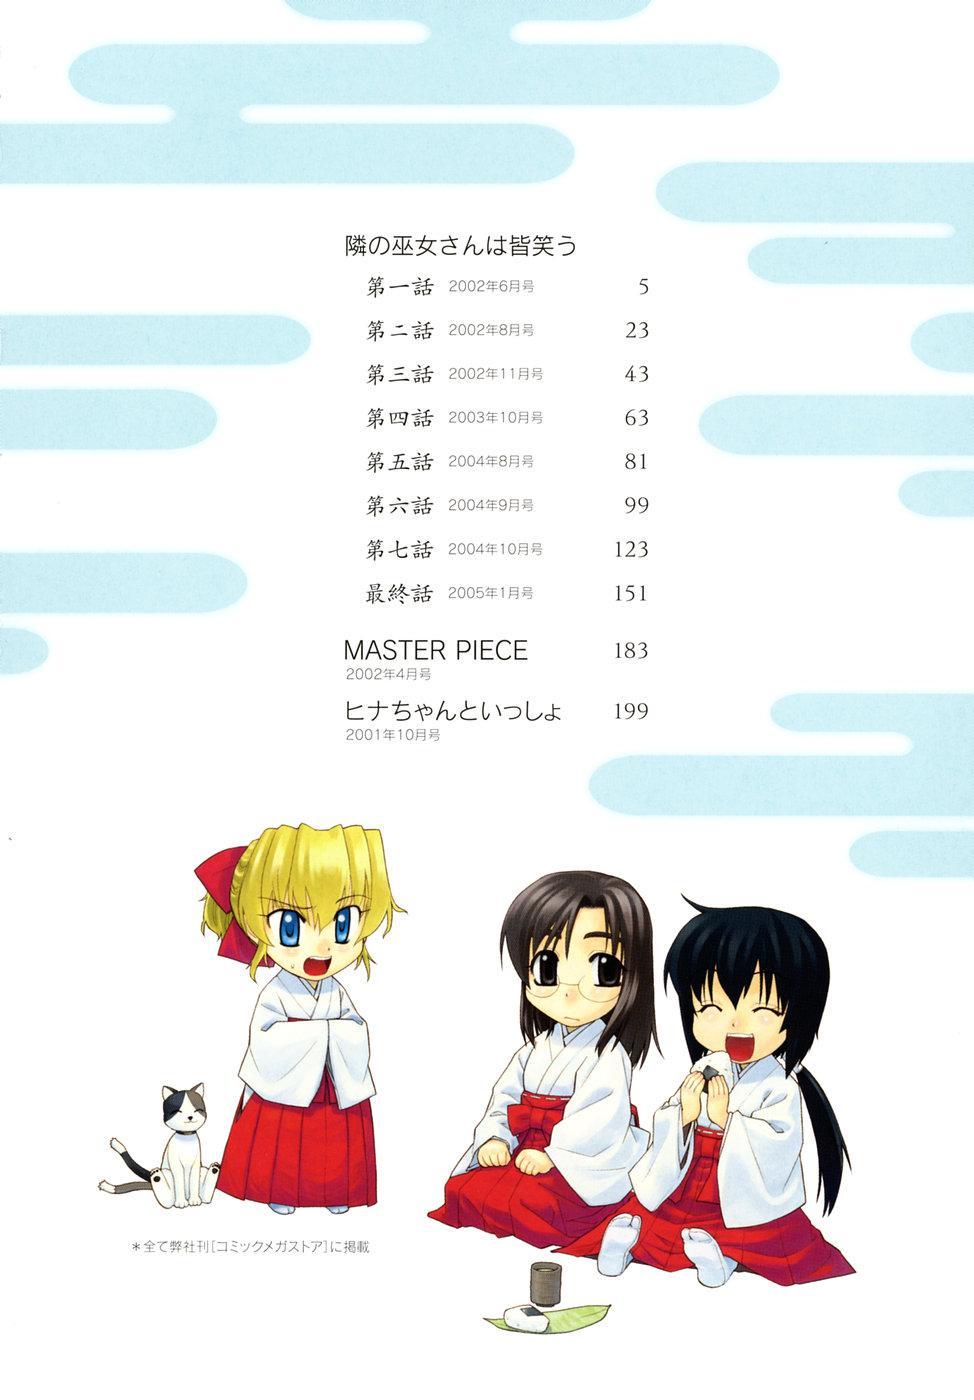 [Yaya Hinata] Tonari no Miko-san wa Minna Warau - The next shrine maidens smile in everyone. 3